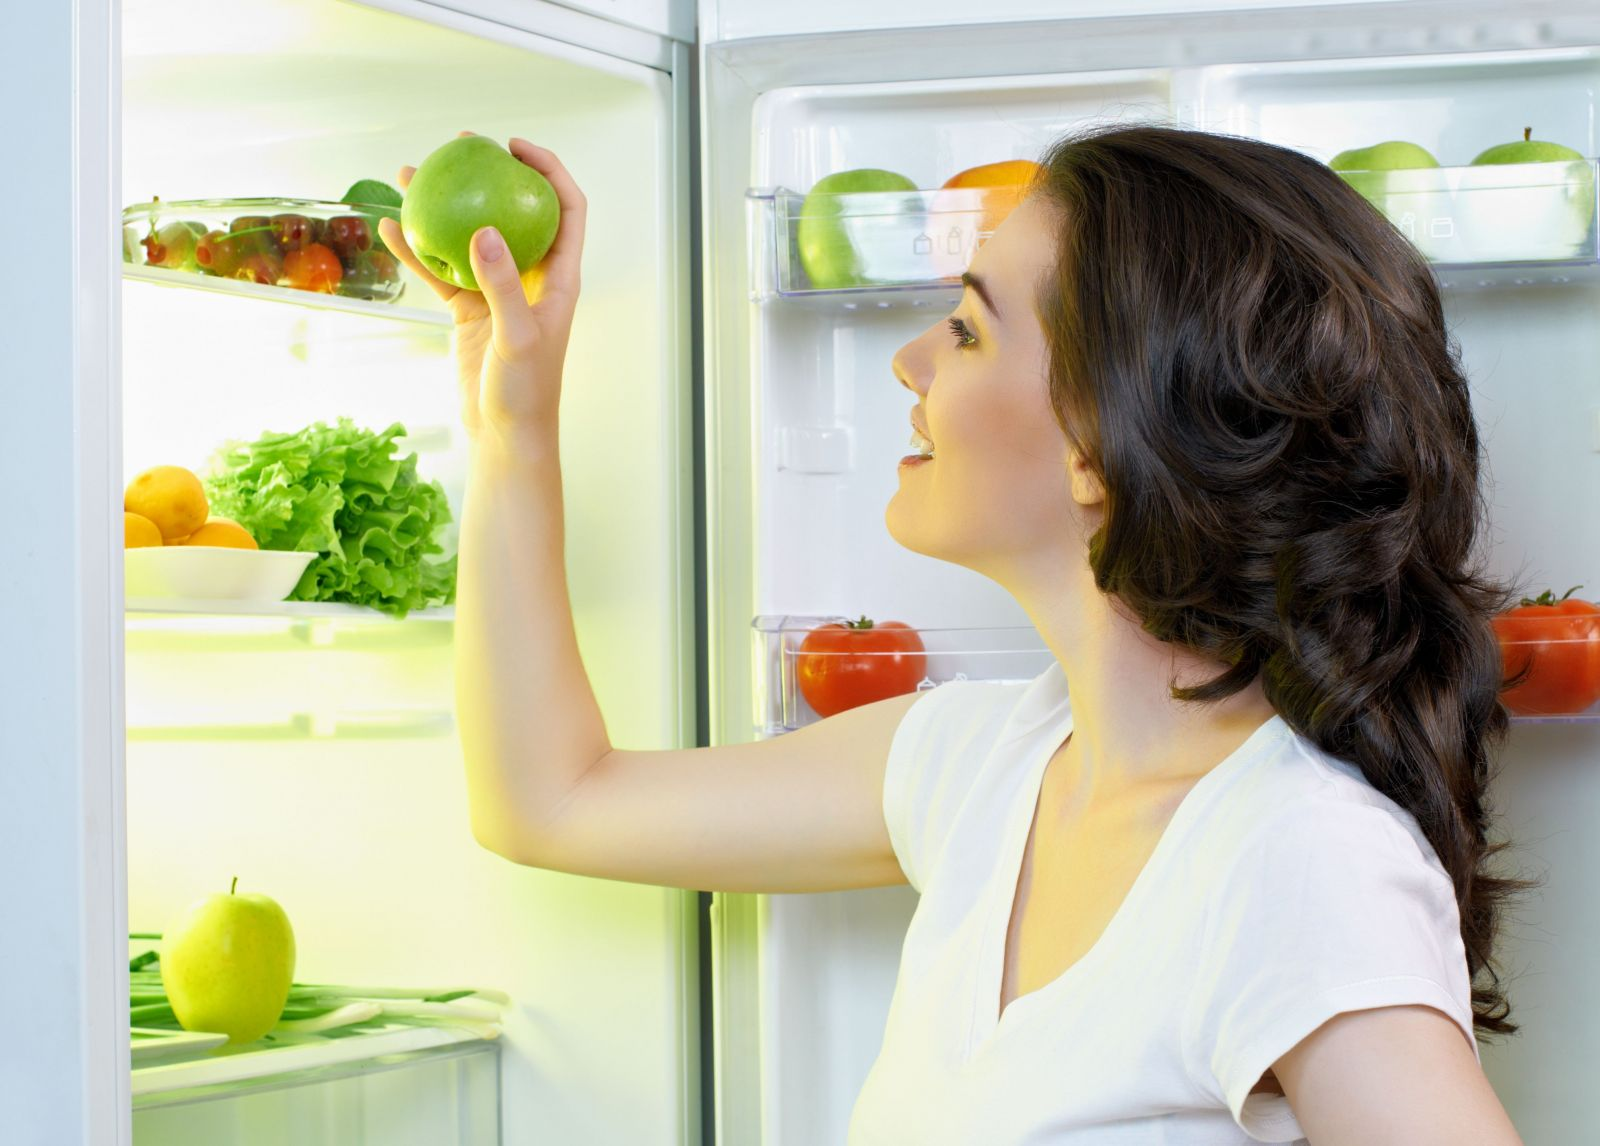 woman-in-refrigerator